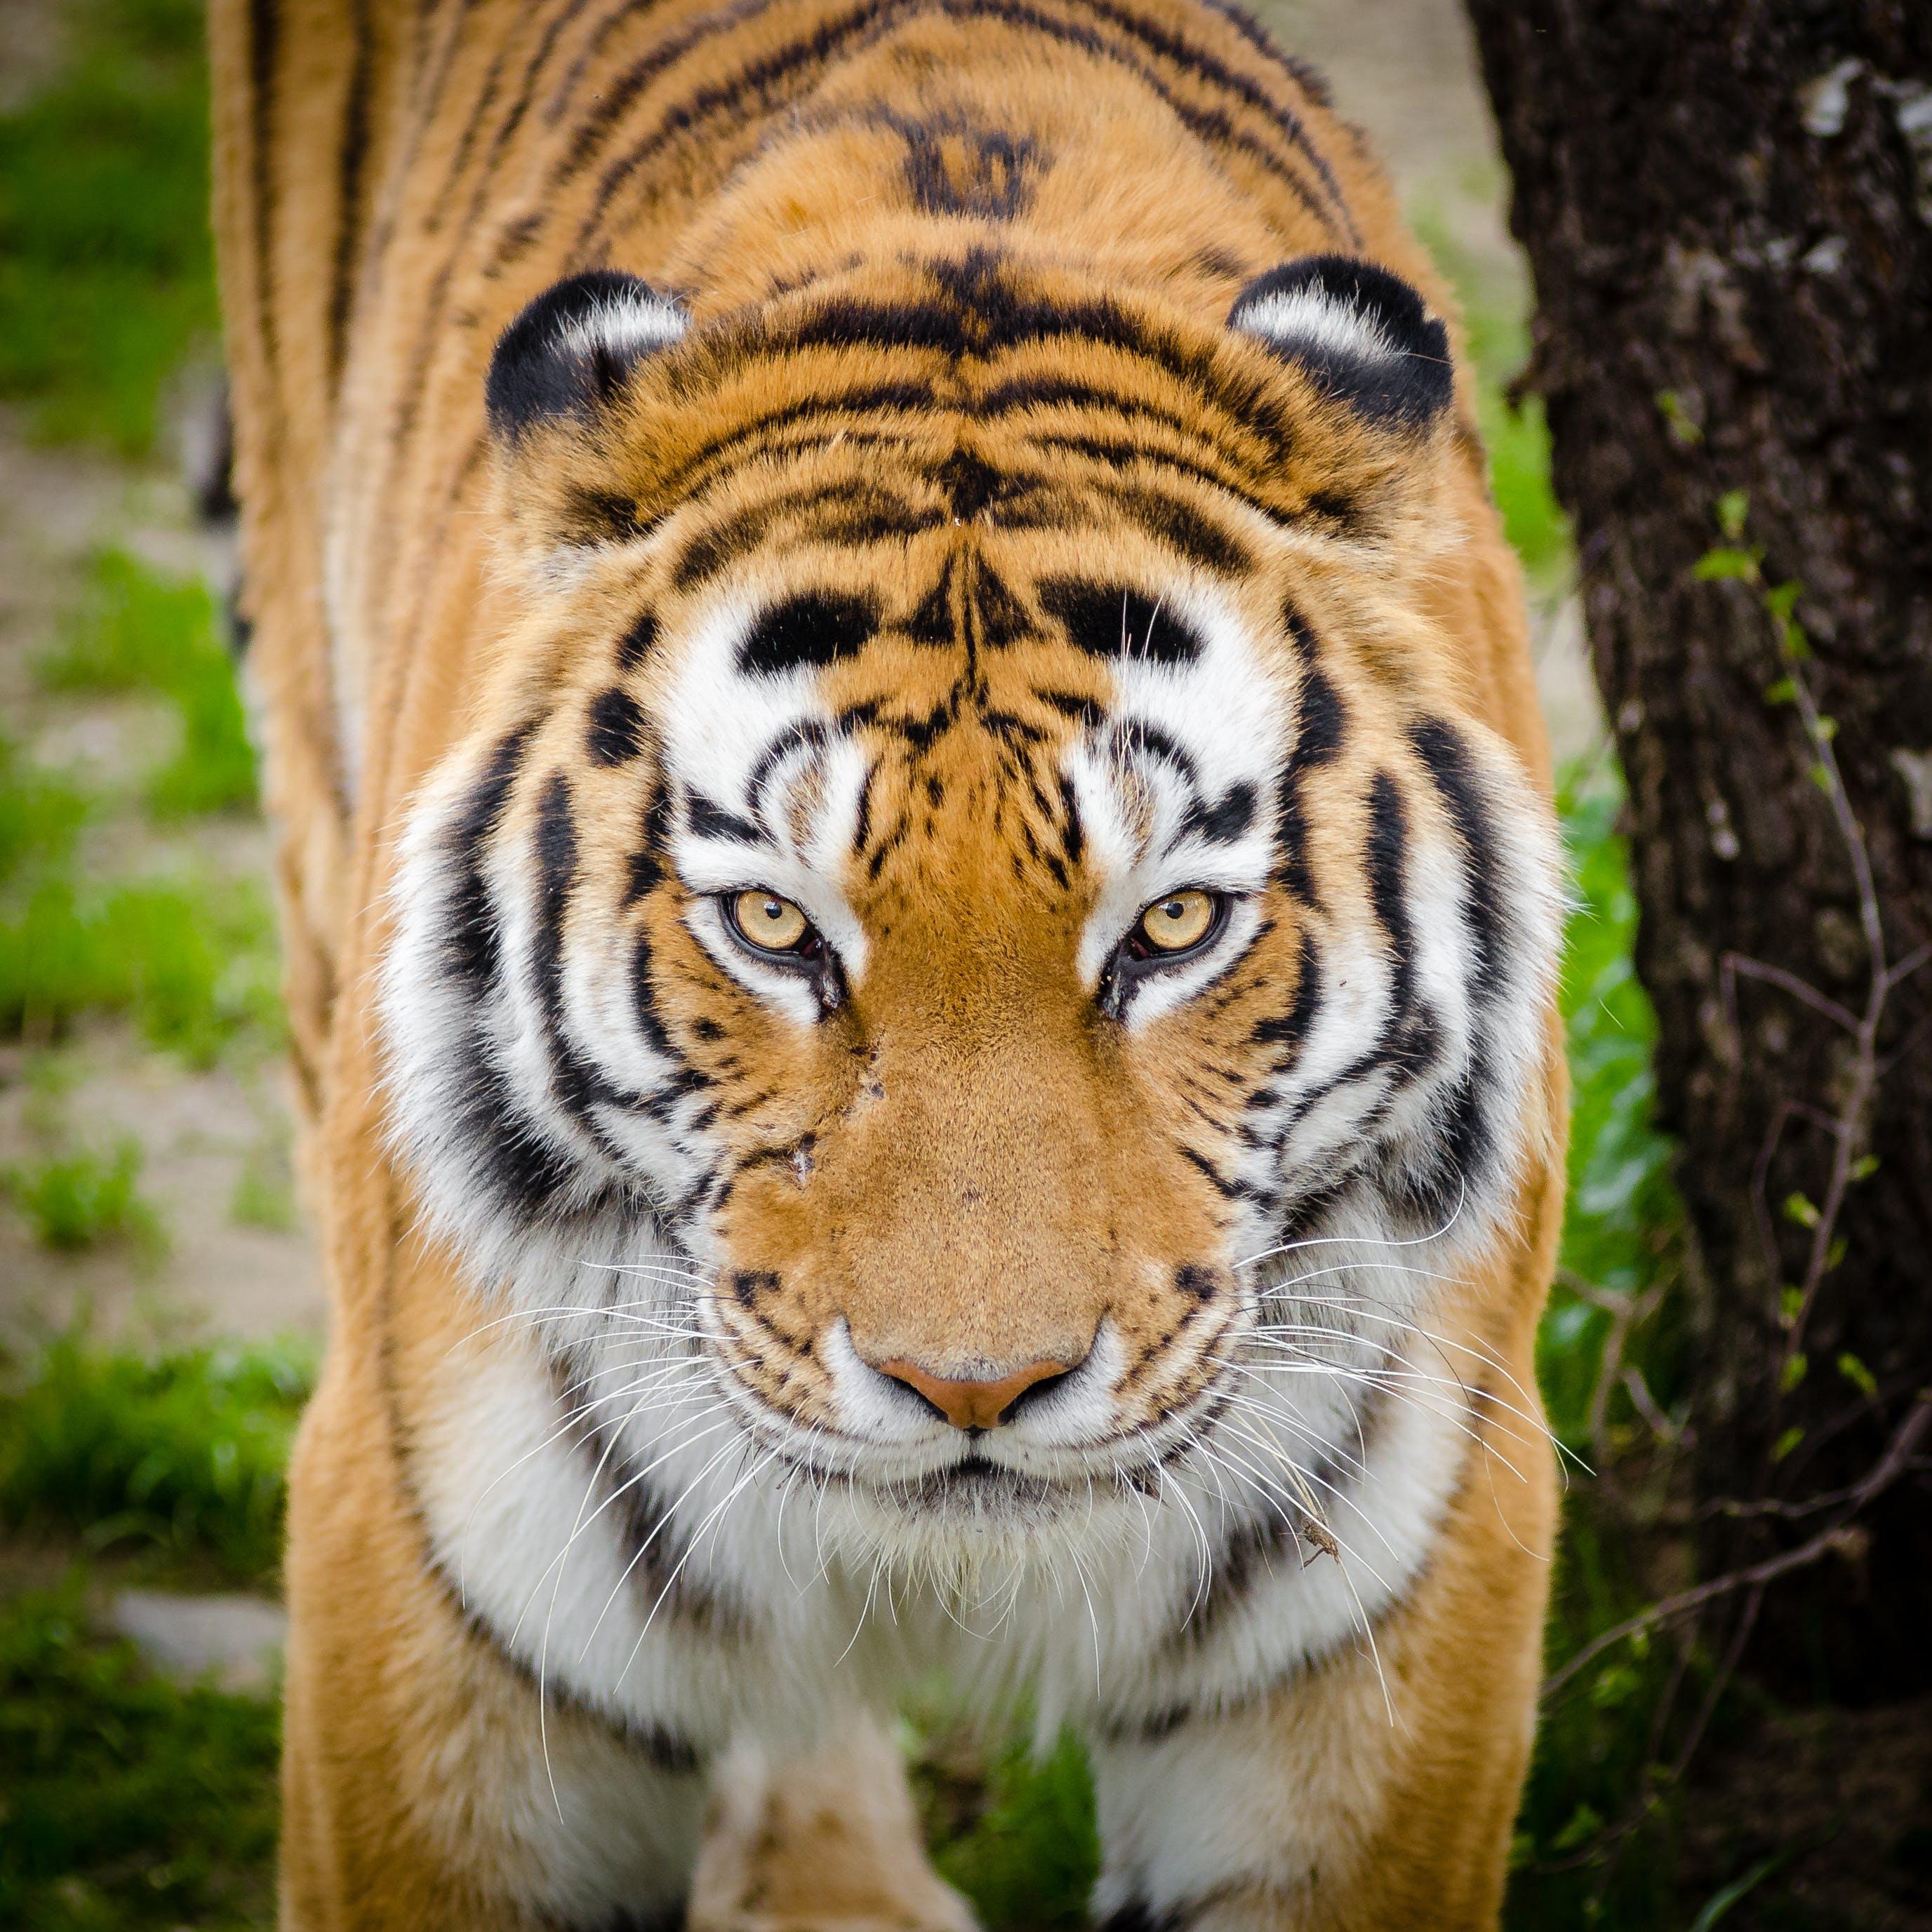 Tiger Beside Tree